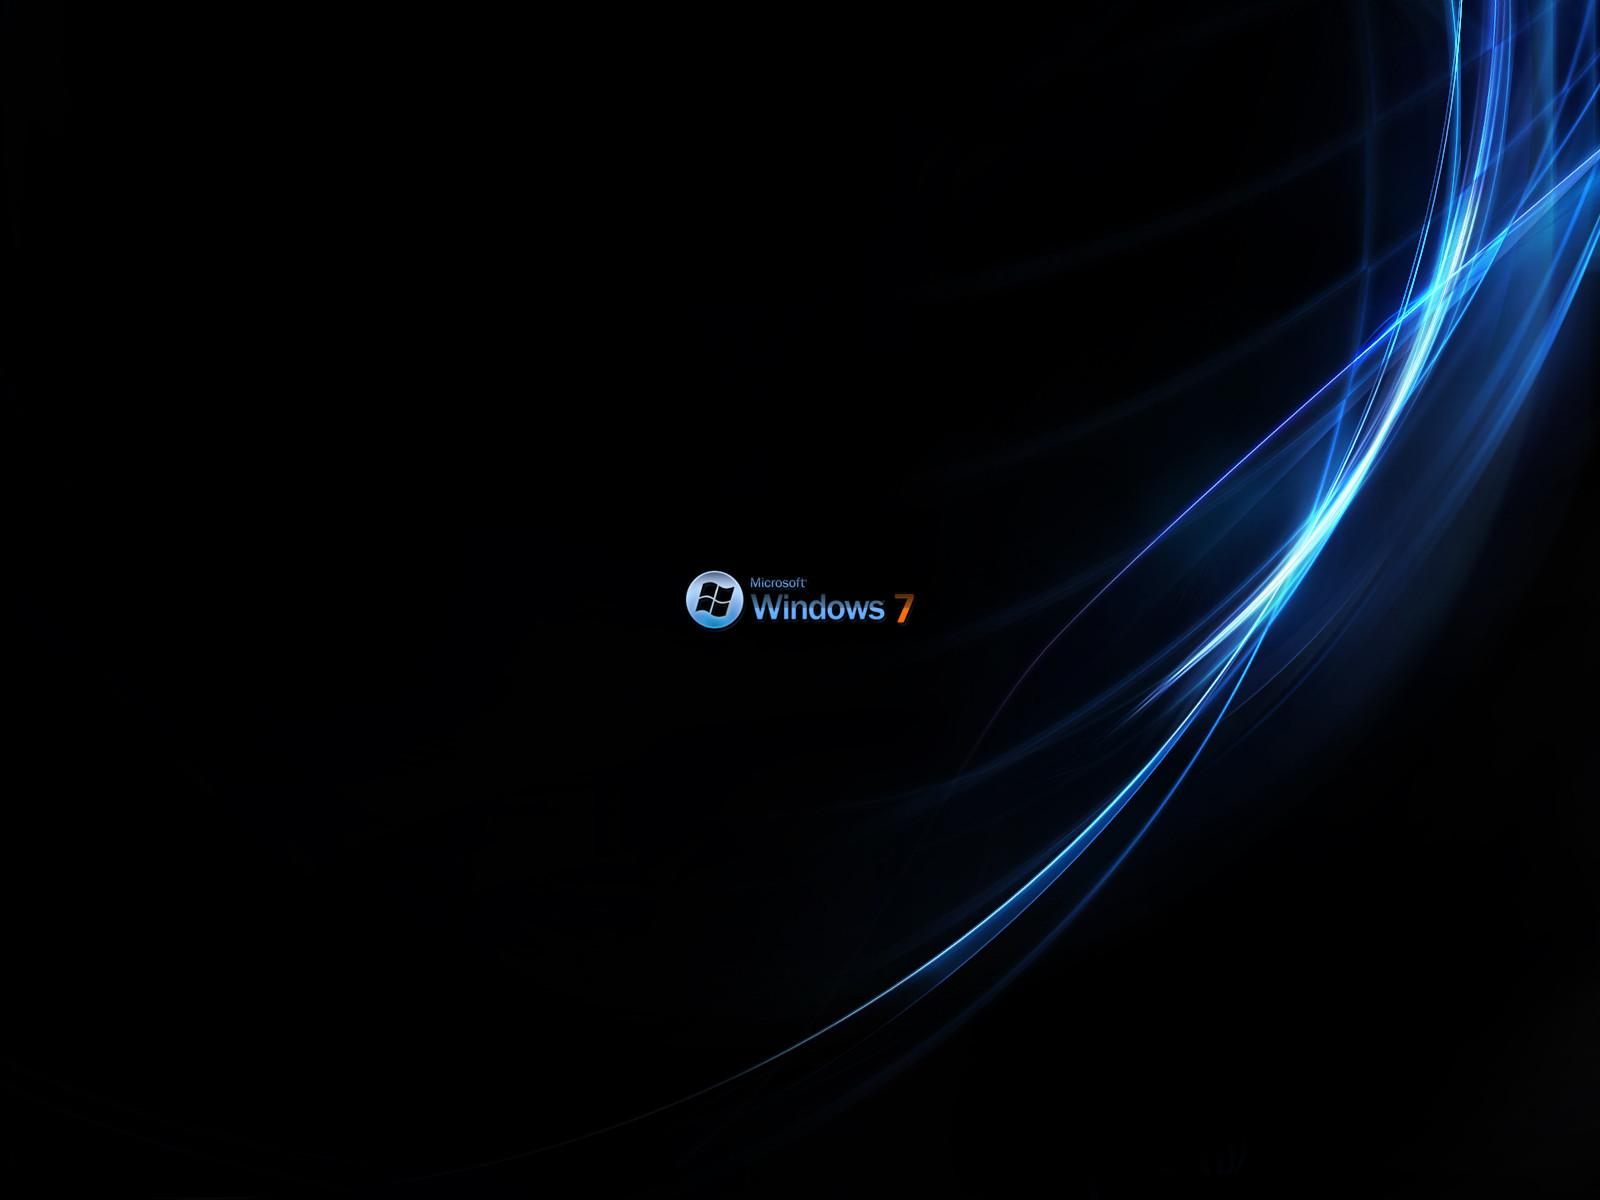 http://1.bp.blogspot.com/_OSg0oYsGQJI/TT_xflMjclI/AAAAAAAAC14/p-3siq7-zjo/s1600/windows7-wallpaper112.jpg